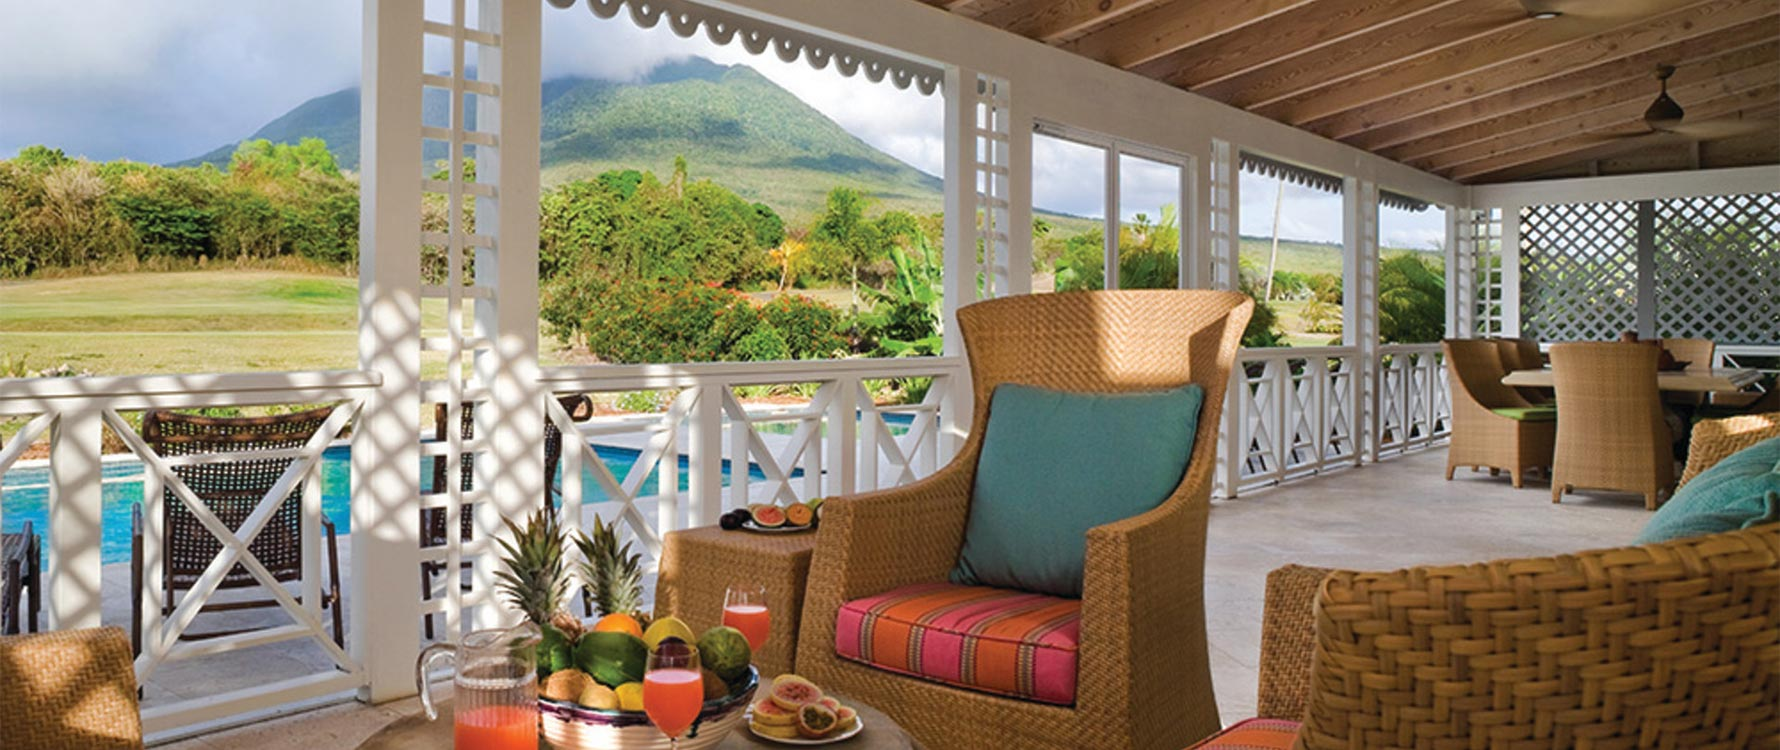 Screened veranda/ lounge area w Nevis Peak View